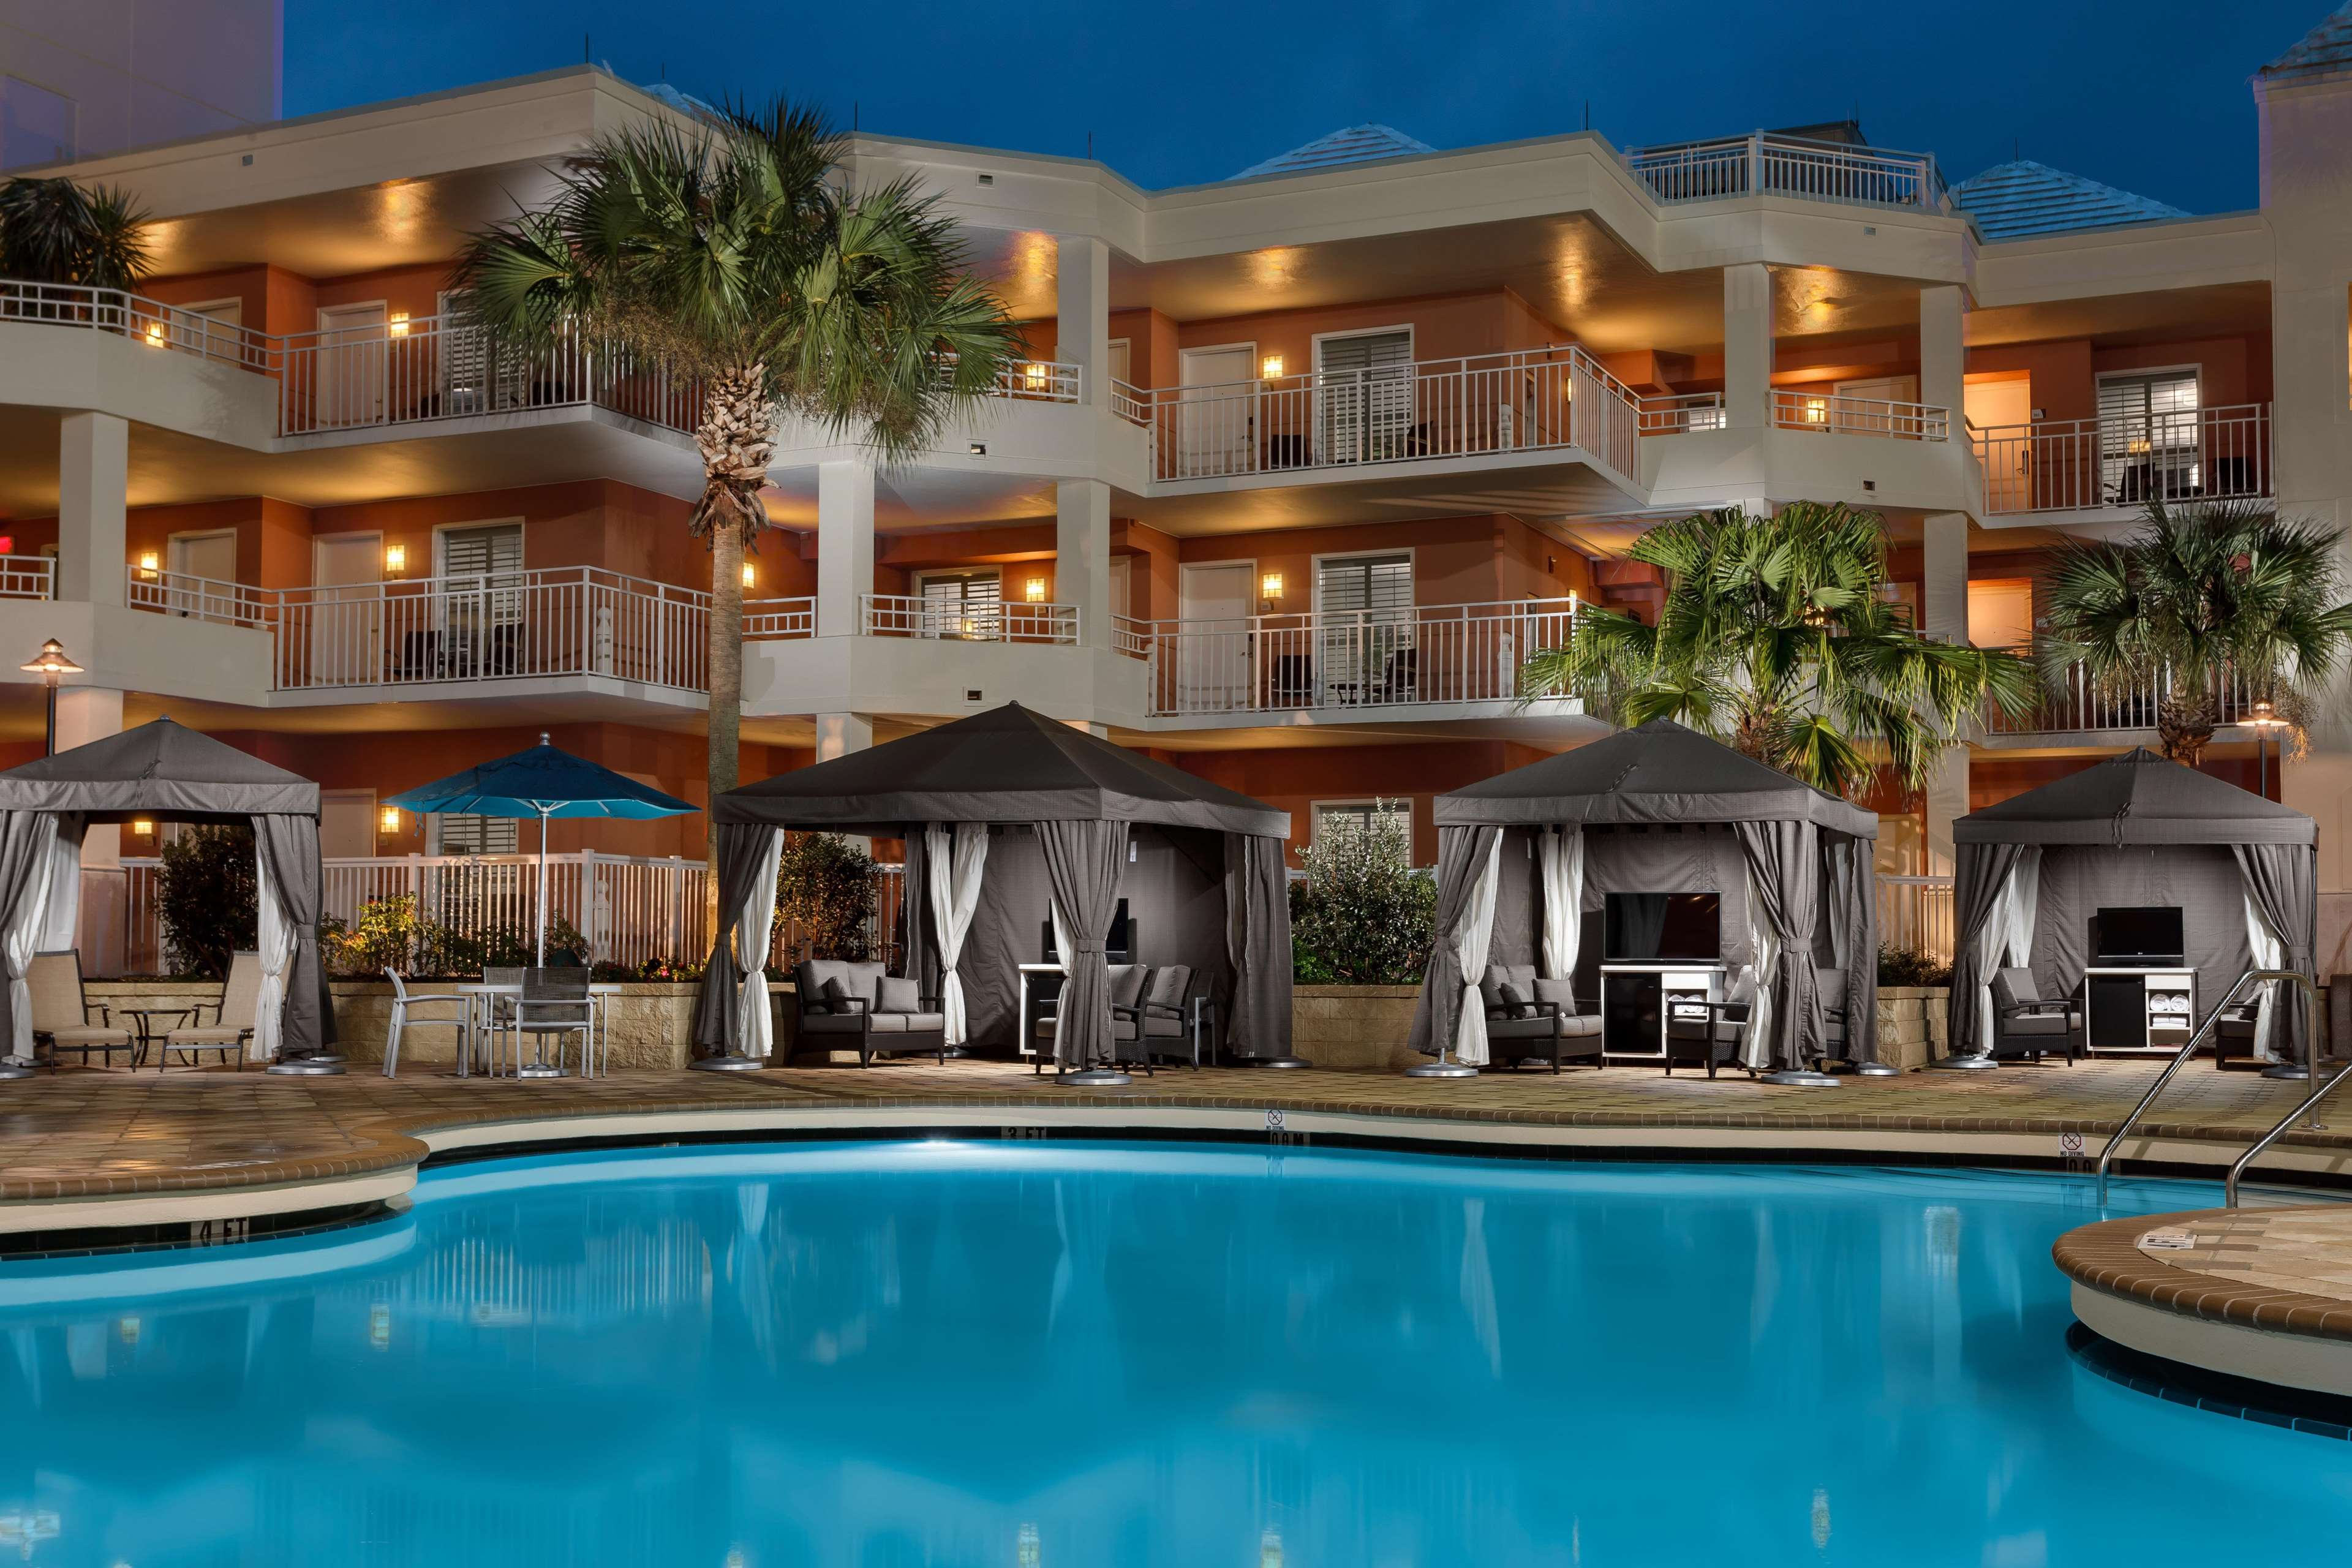 Embassy Suites by Hilton Orlando Lake Buena Vista Resort image 9